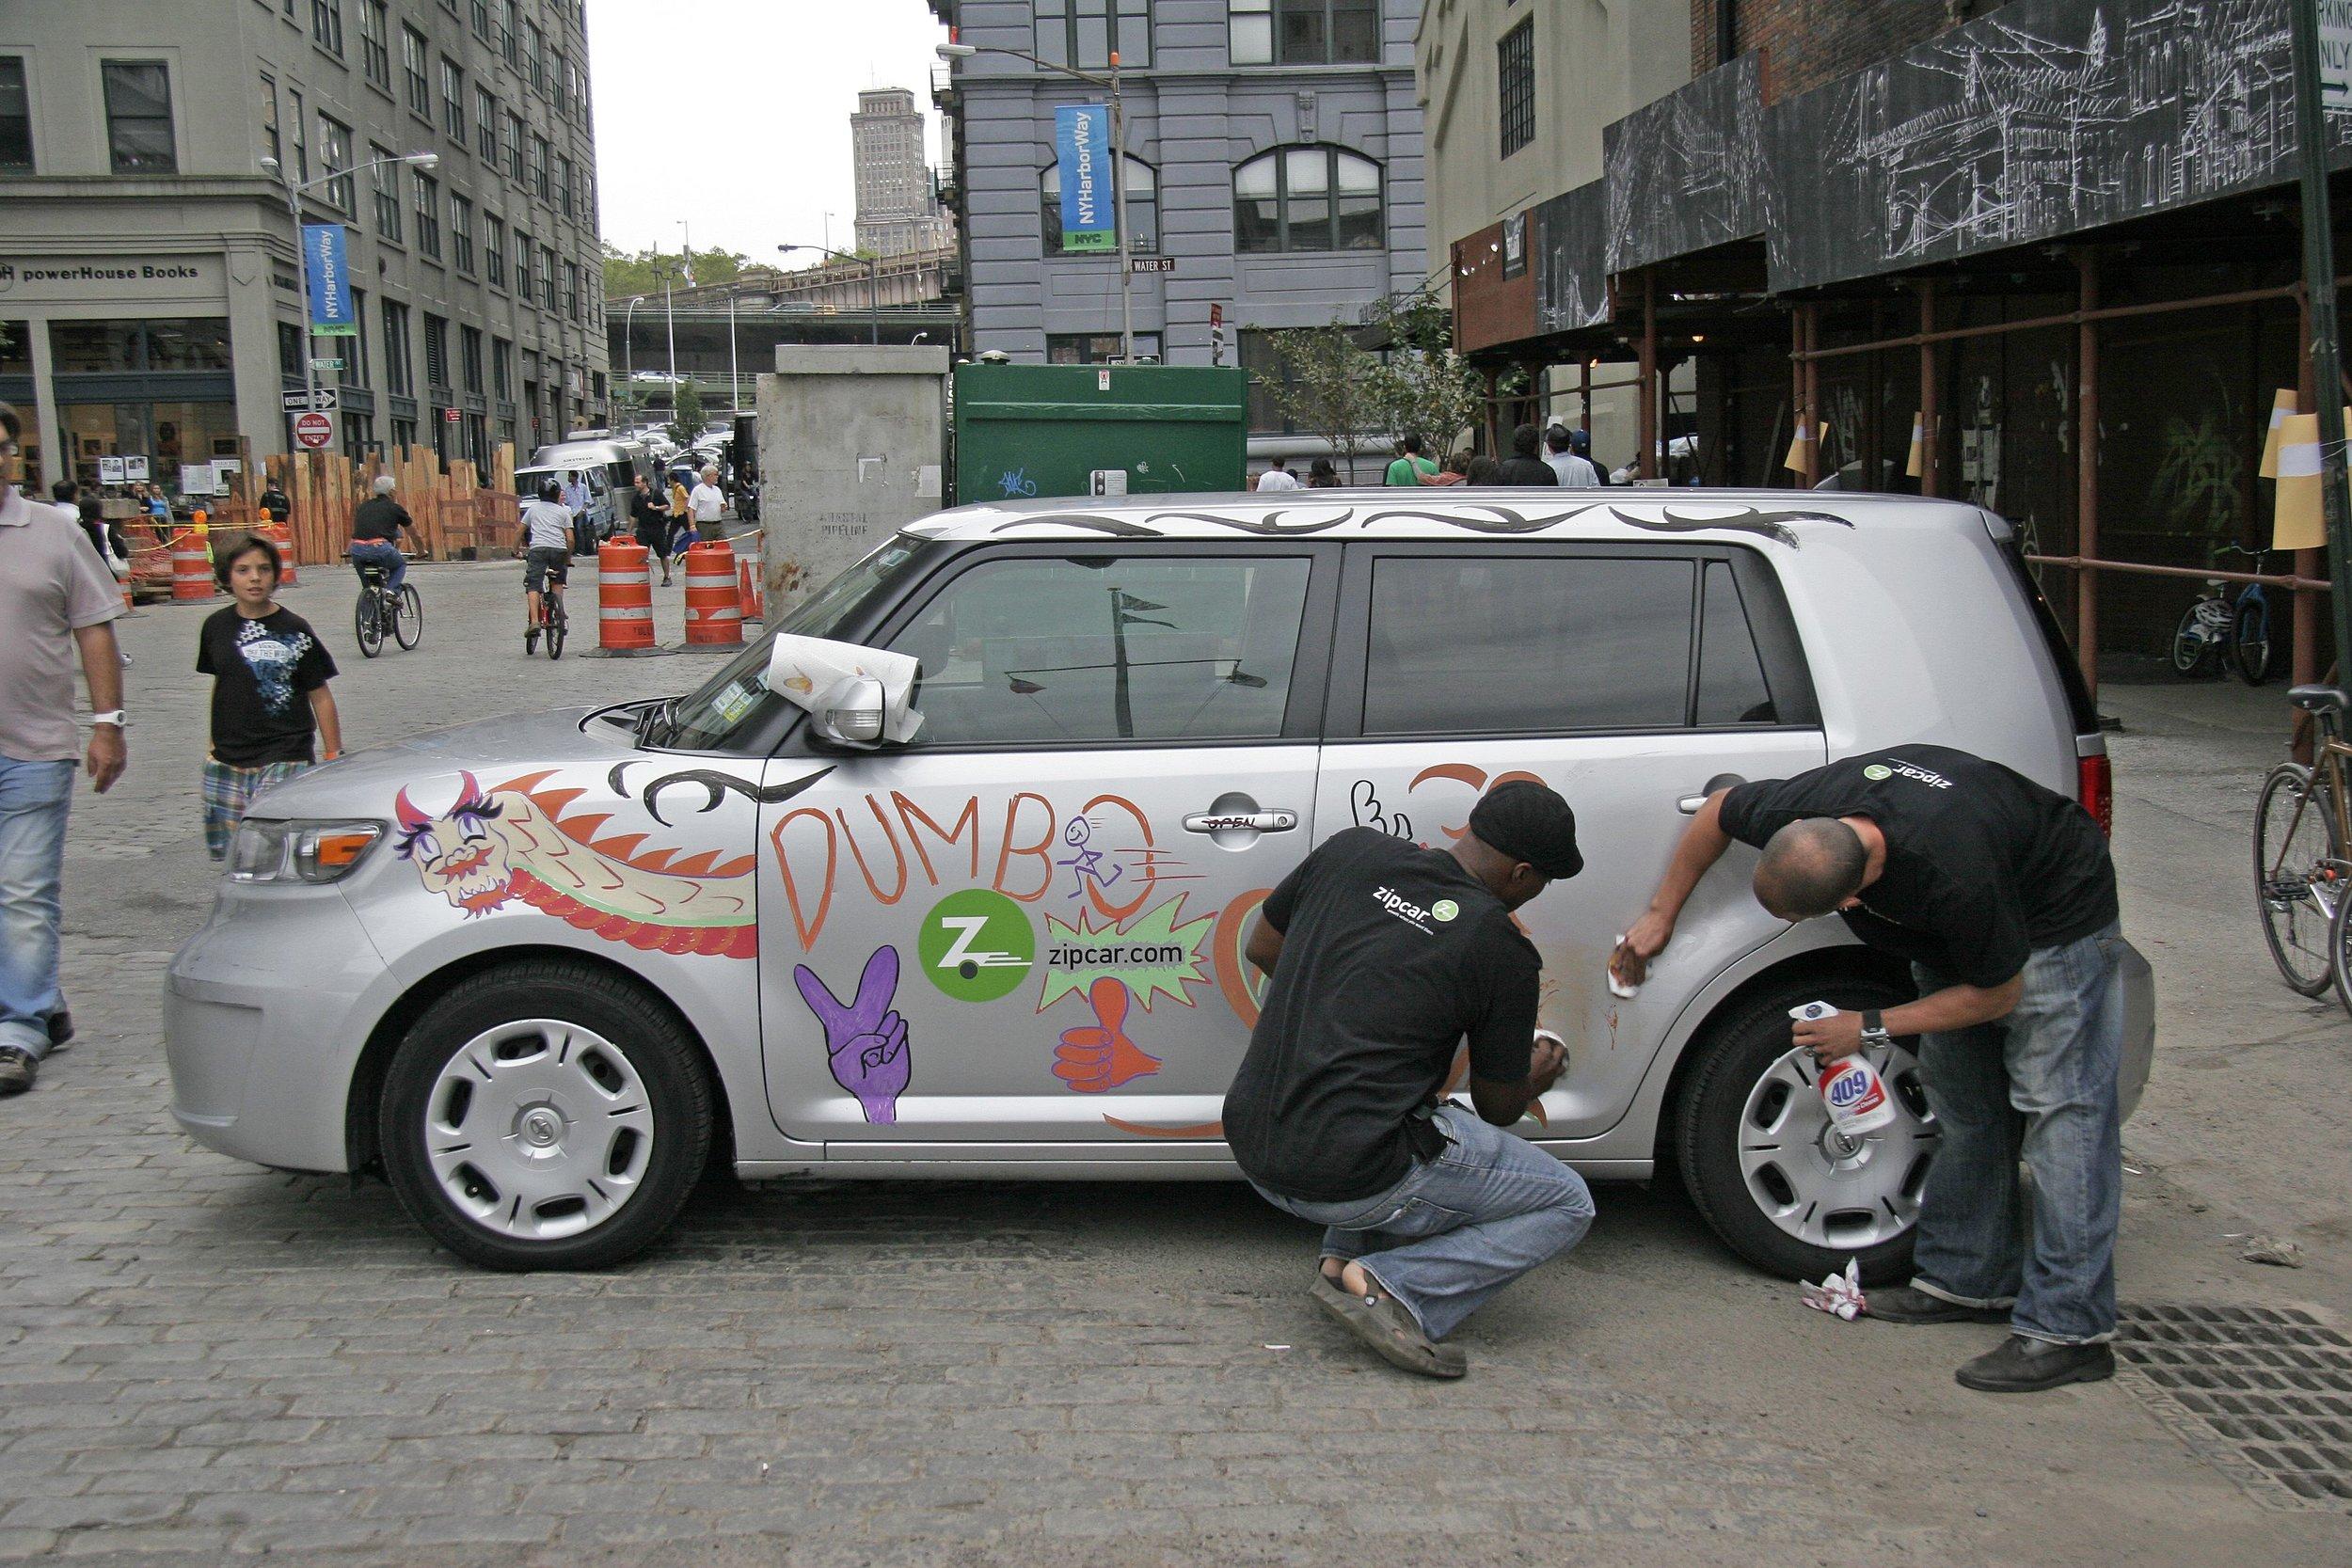 ZipCar Sponsorship